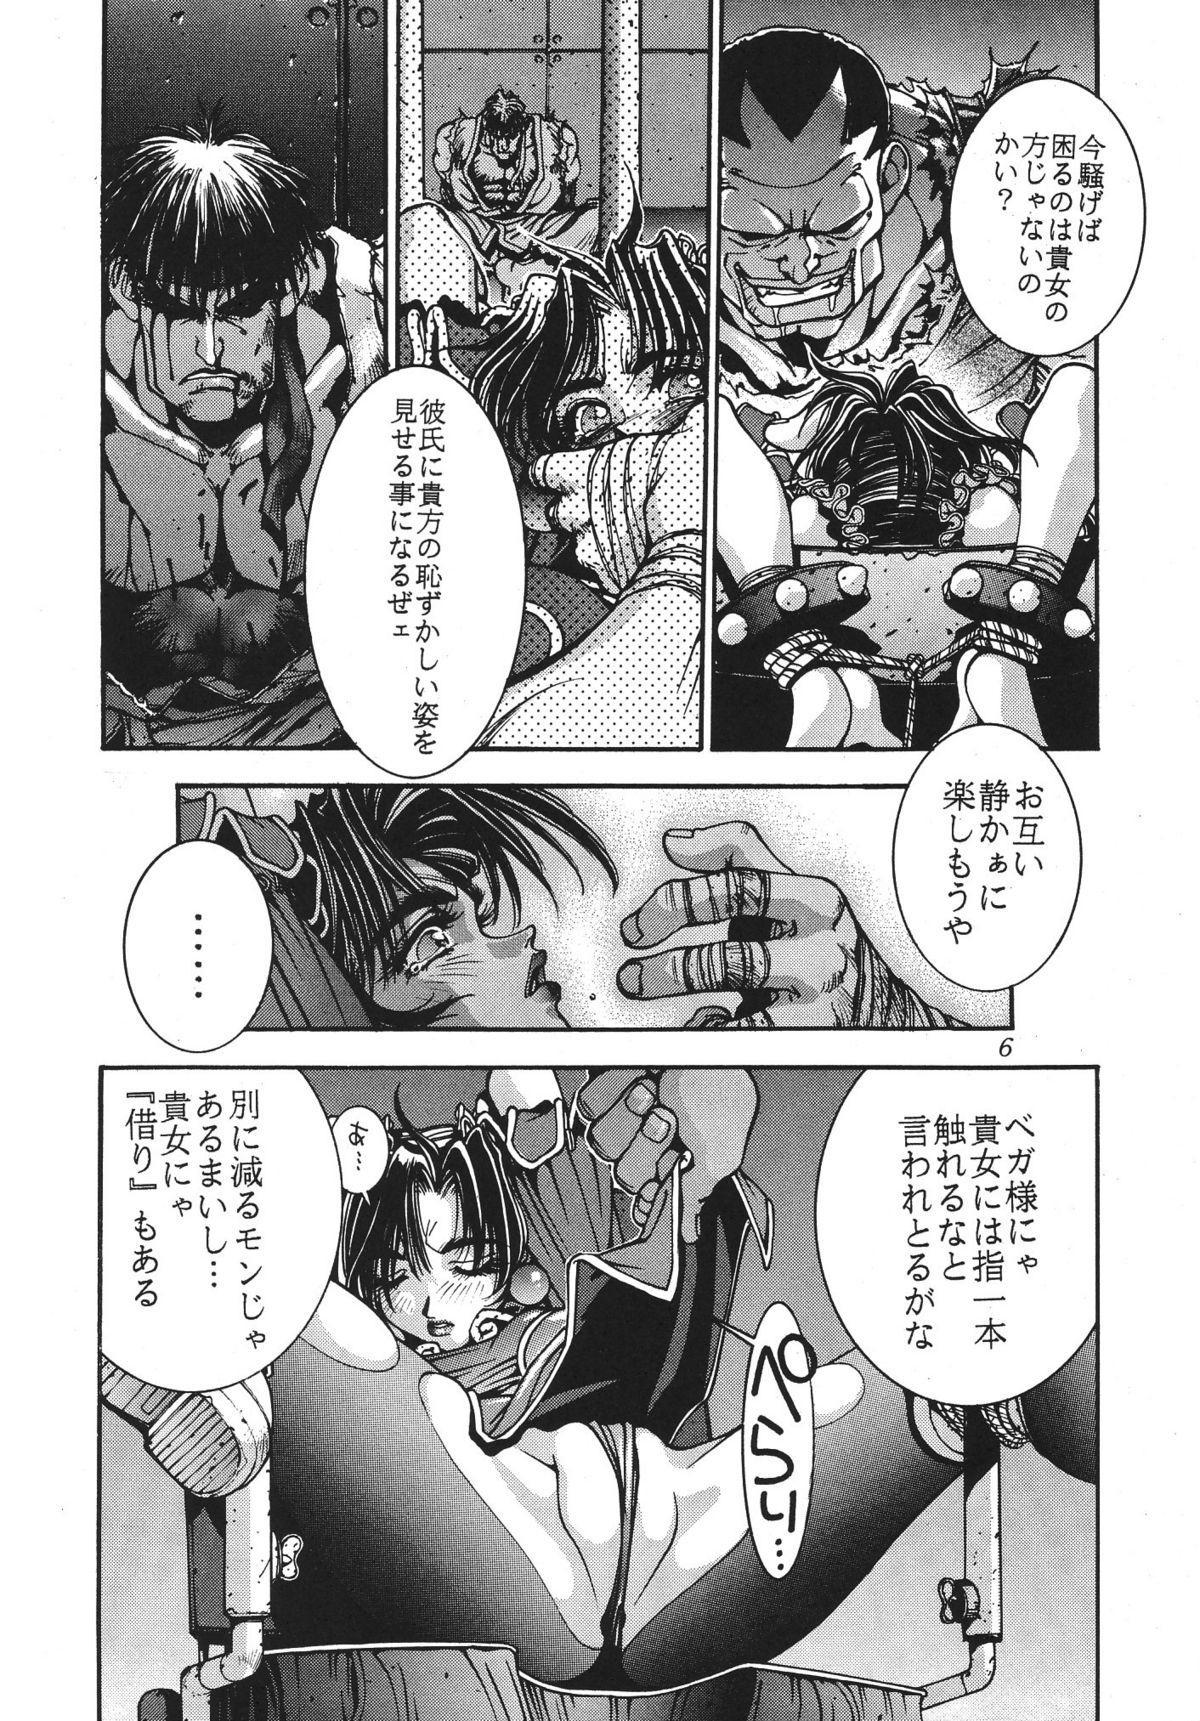 Kakutou Complete Gekan 6